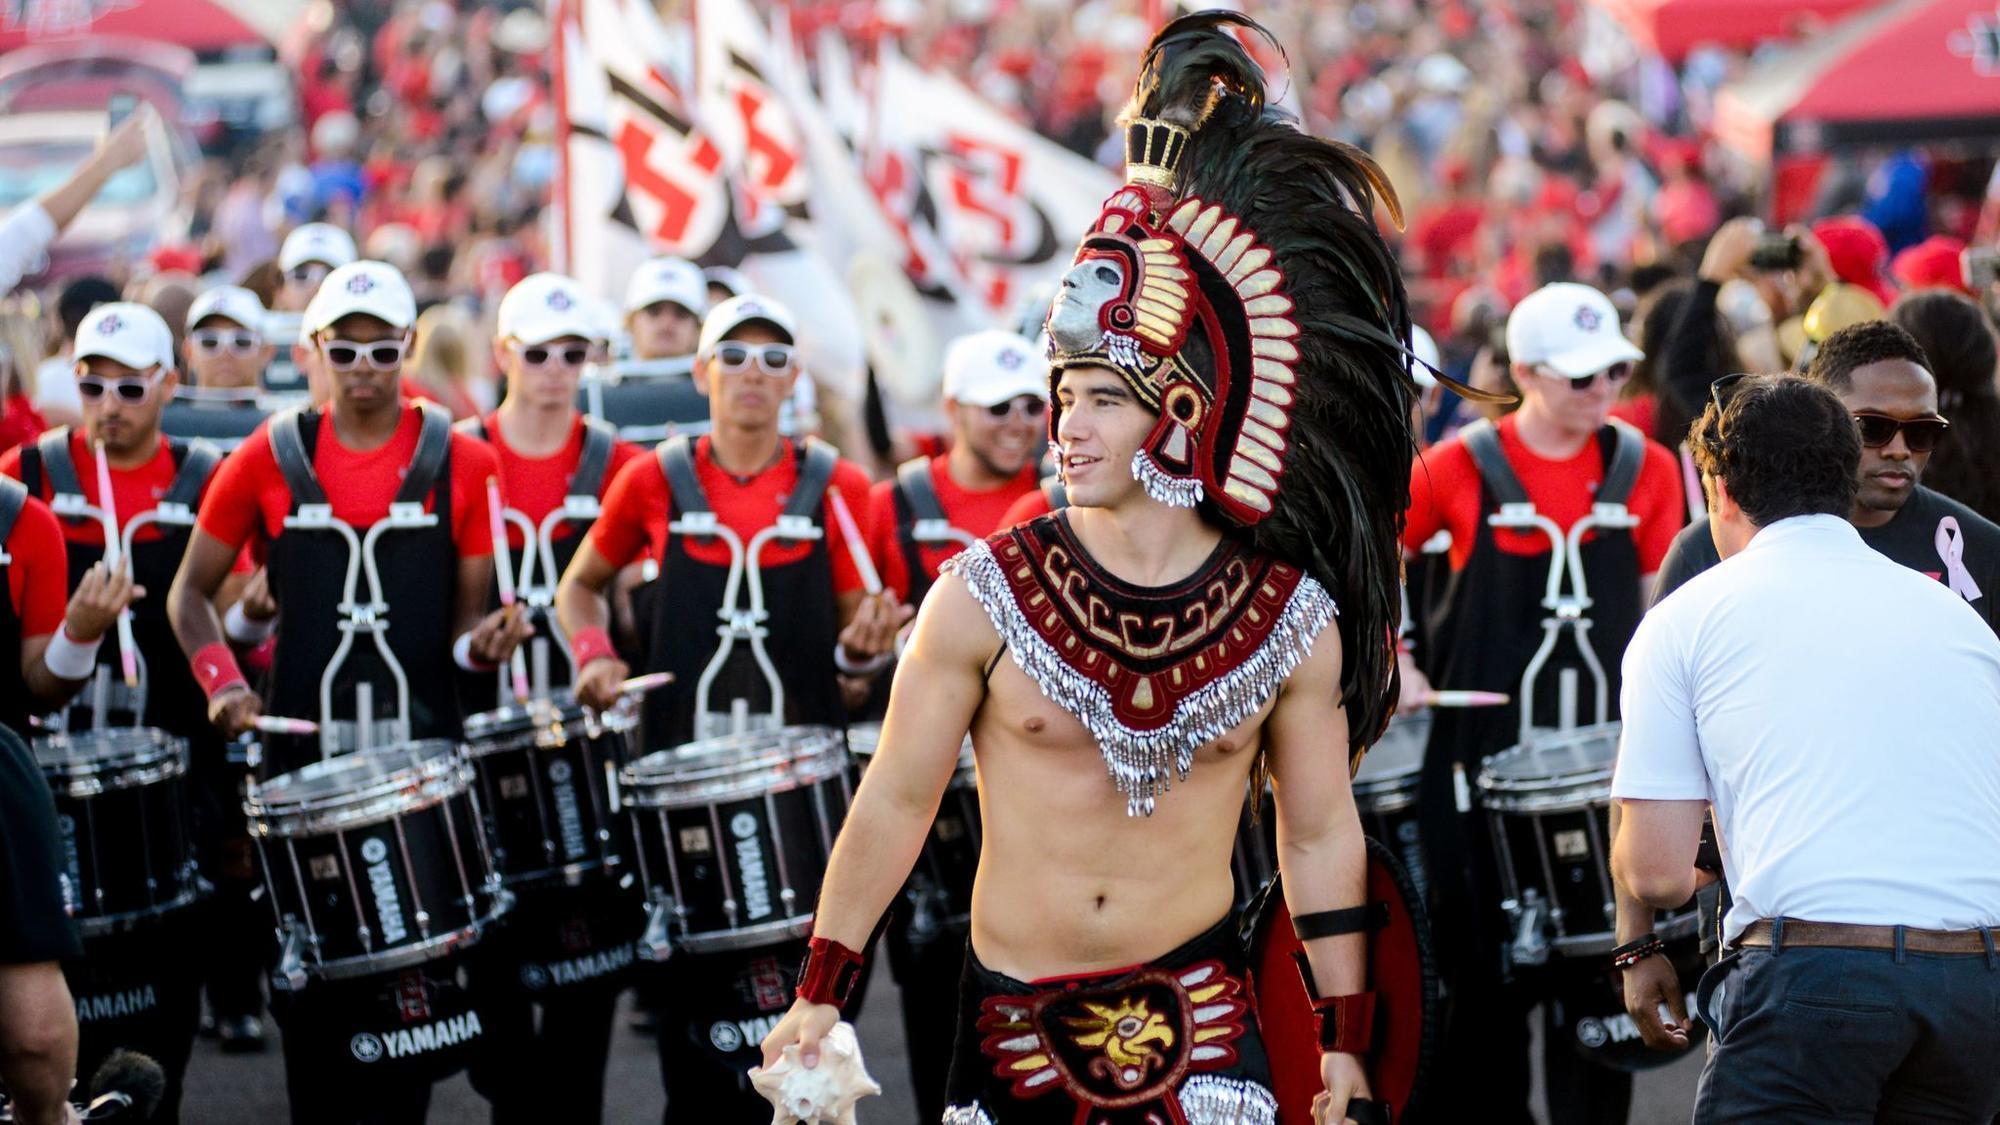 Sd-sp-aztecs-mascot-nickname-task-force-0120